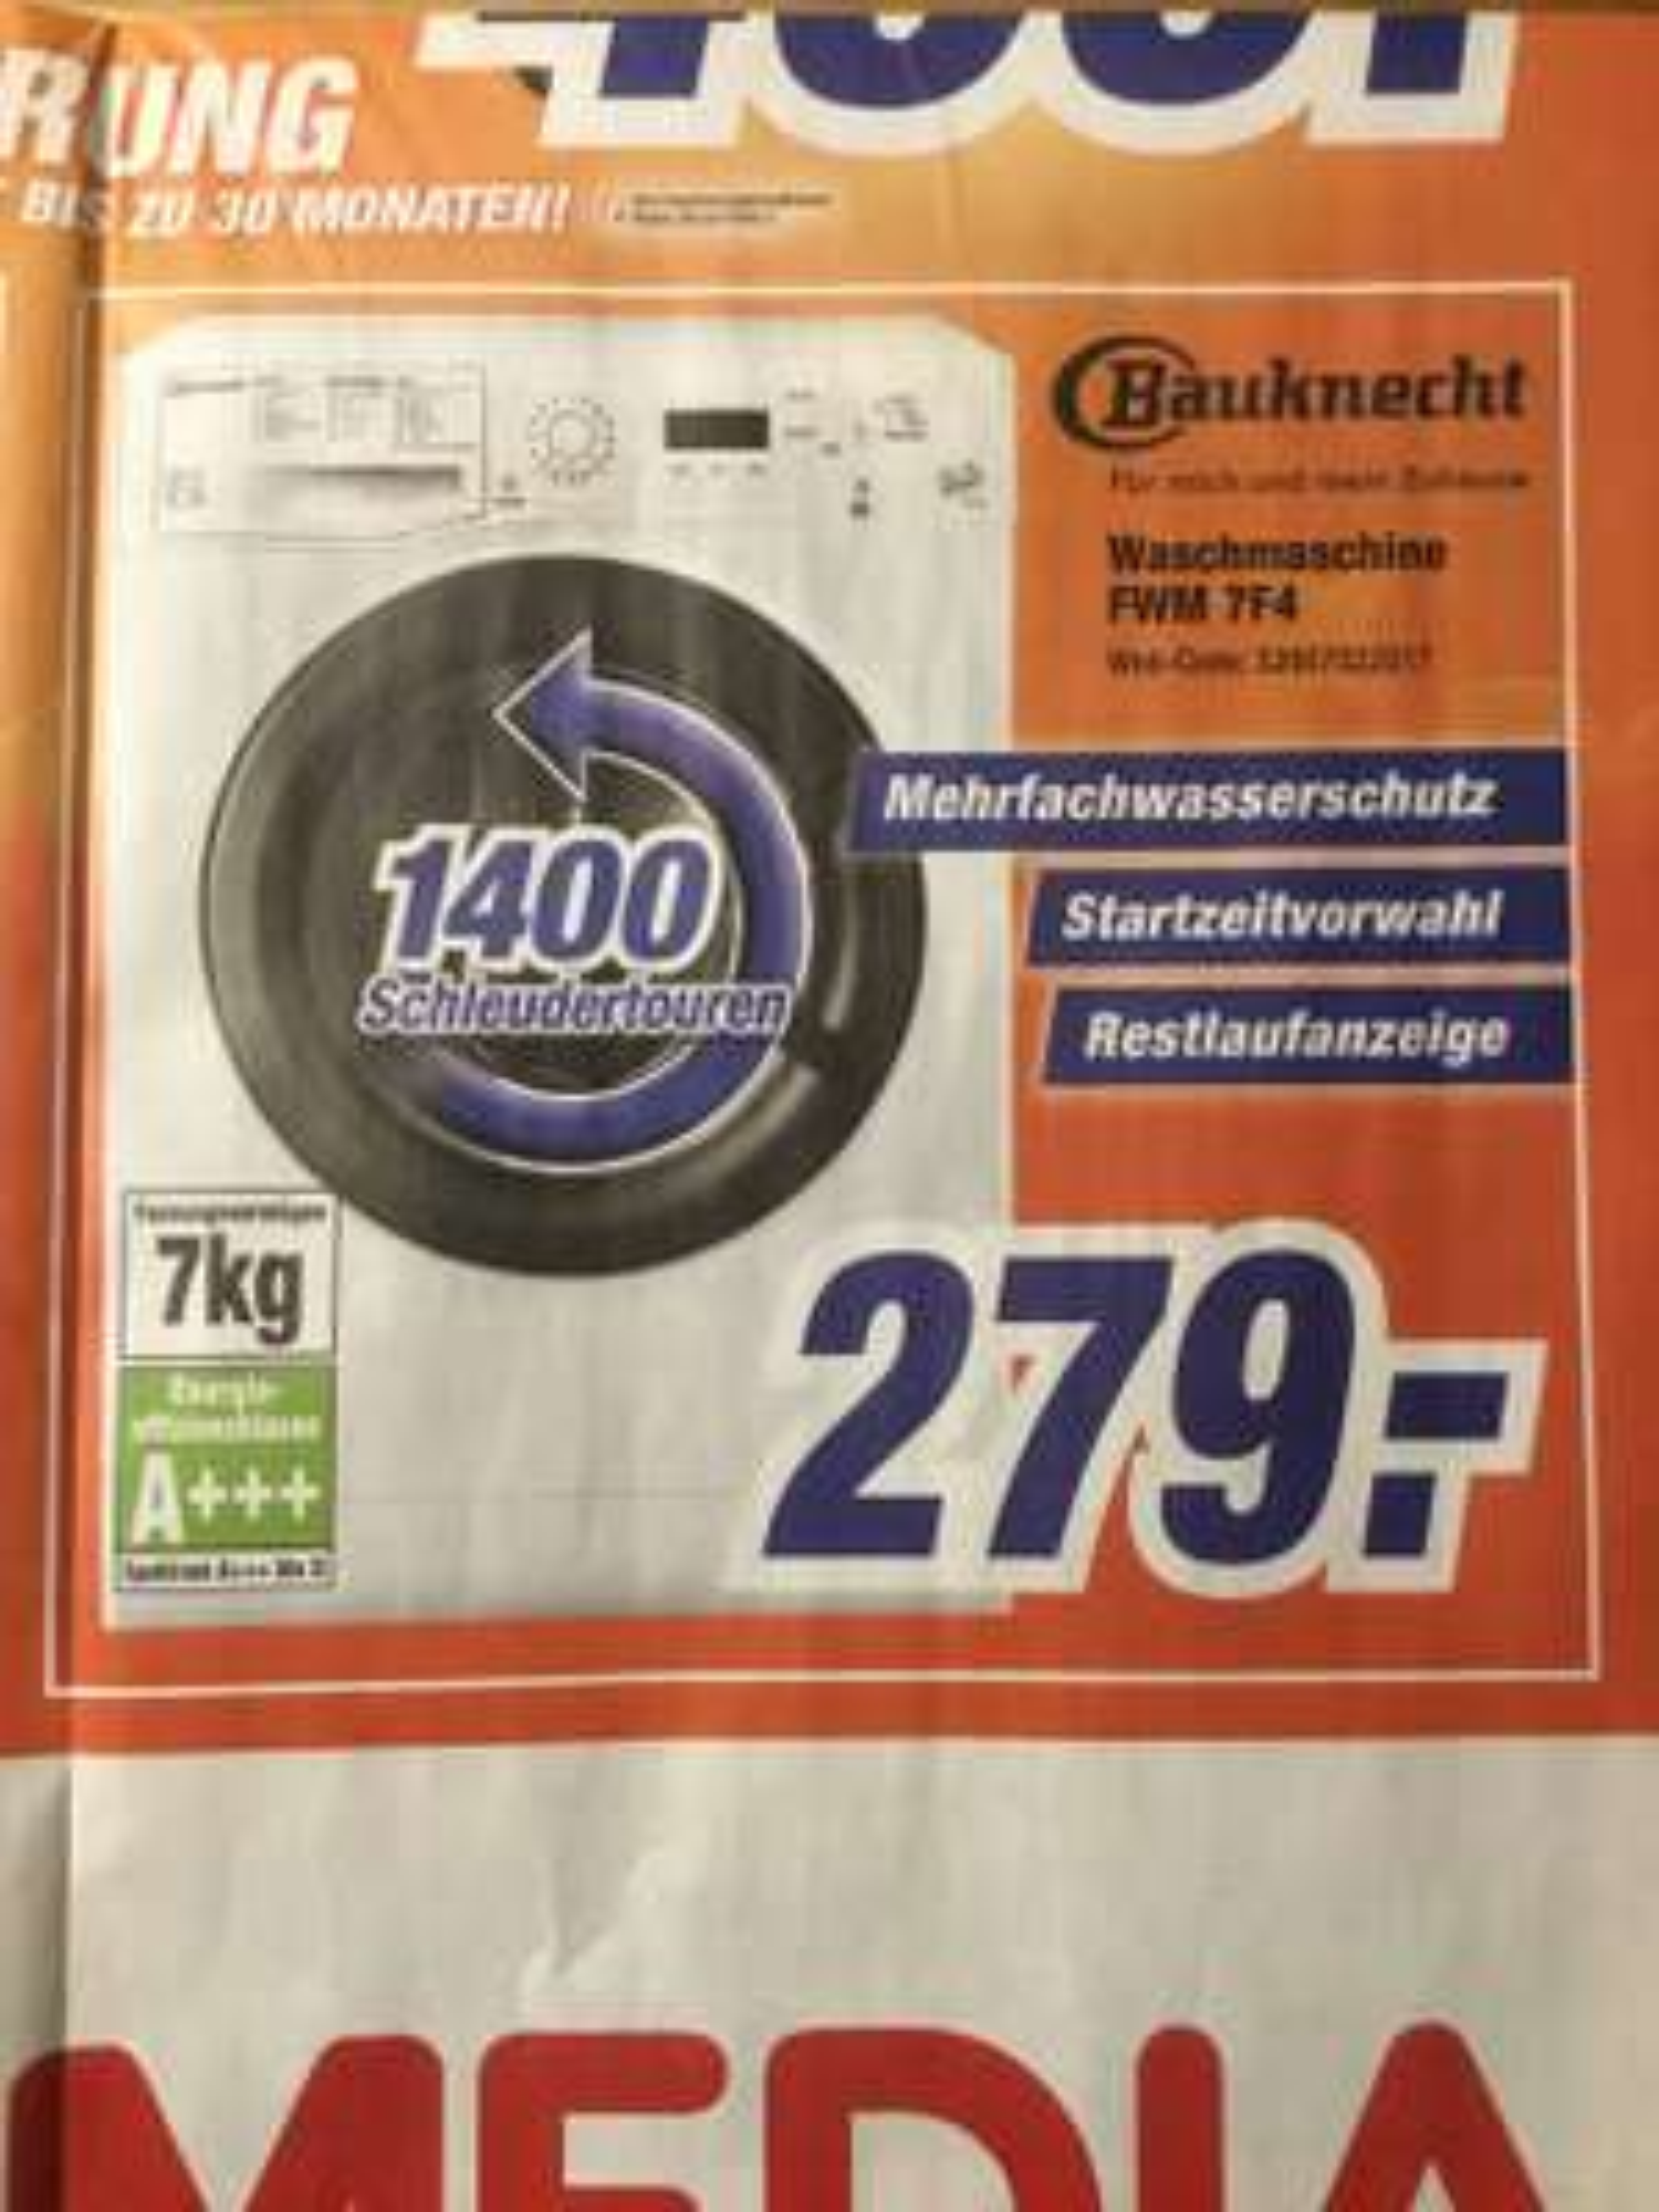 Bauknecht Waschmaschine FWM 7F4 [online & lokal Expert Octomedia Rastatt, Bühl, Lahr, Waldshut-Tiengen]